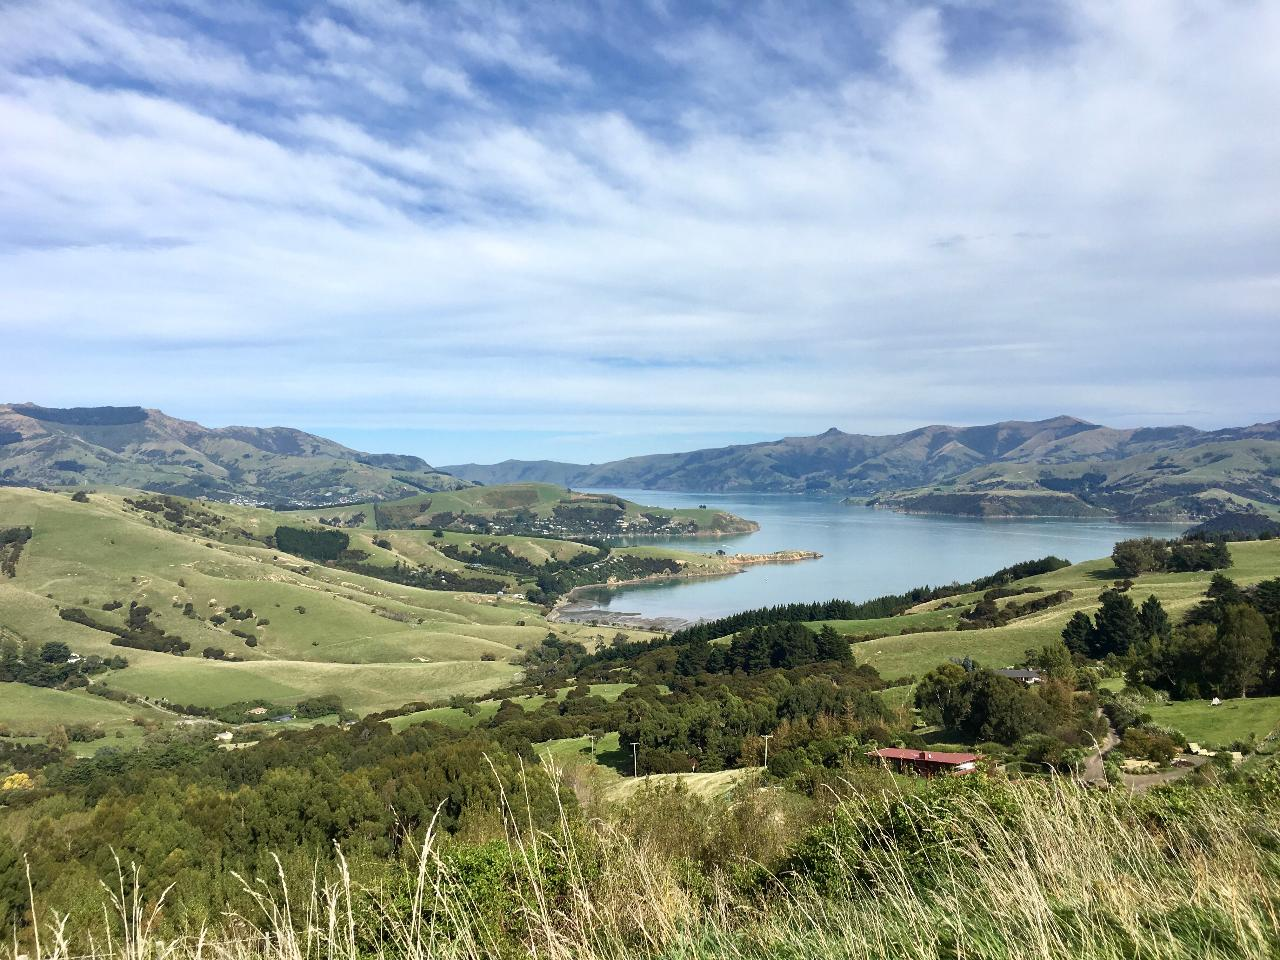 Akaroa - The Bays - Christchurch - Akaroa Day Tour with Black Cat Cruise and optional Shamarra Alpacas Farm Tour and The Giants House